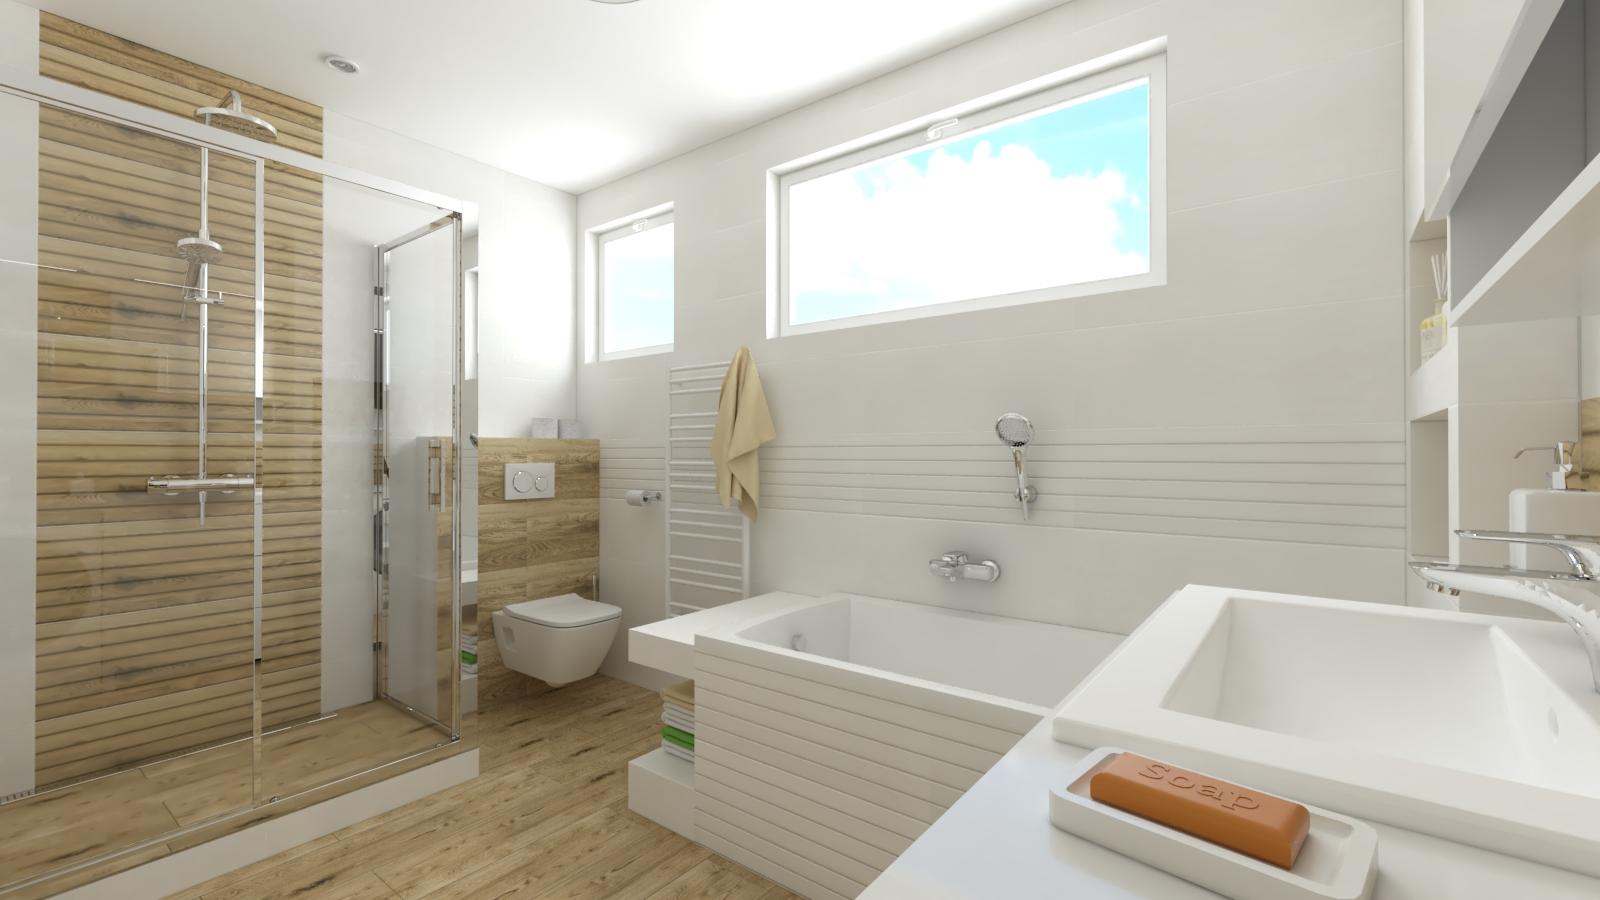 biely radiátor v kúpeľni